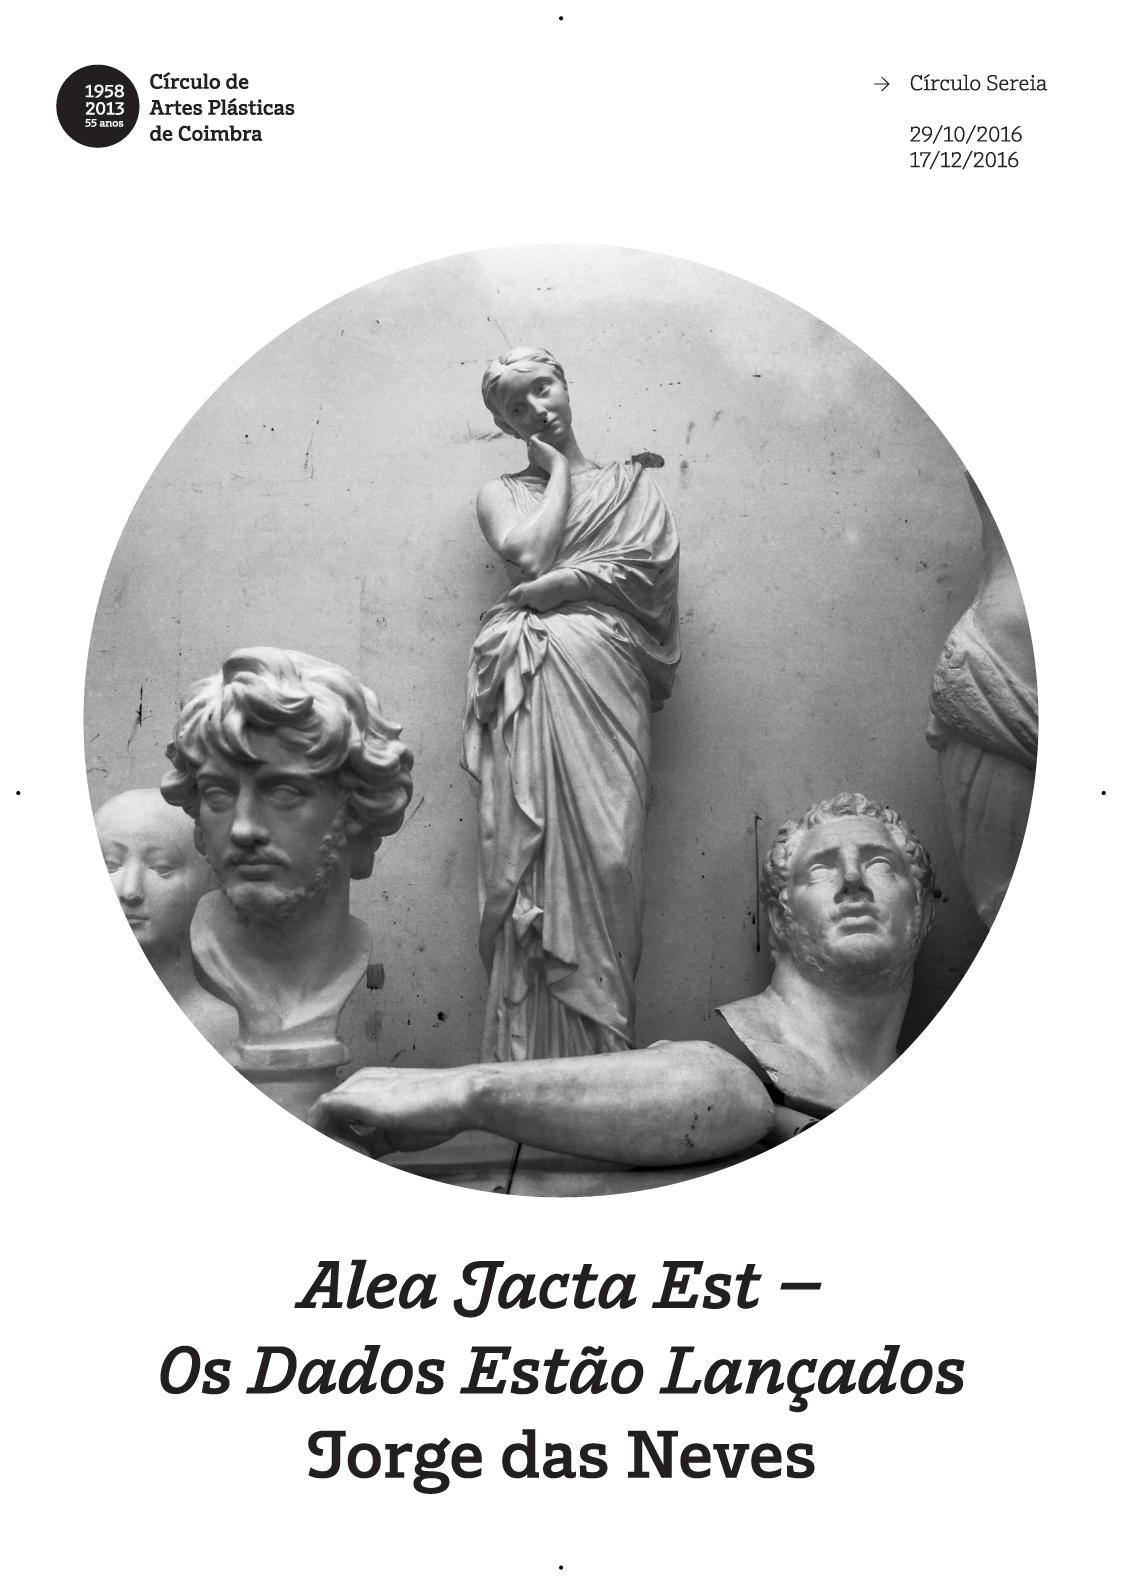 alea-jacta-est-jorge-das-neves